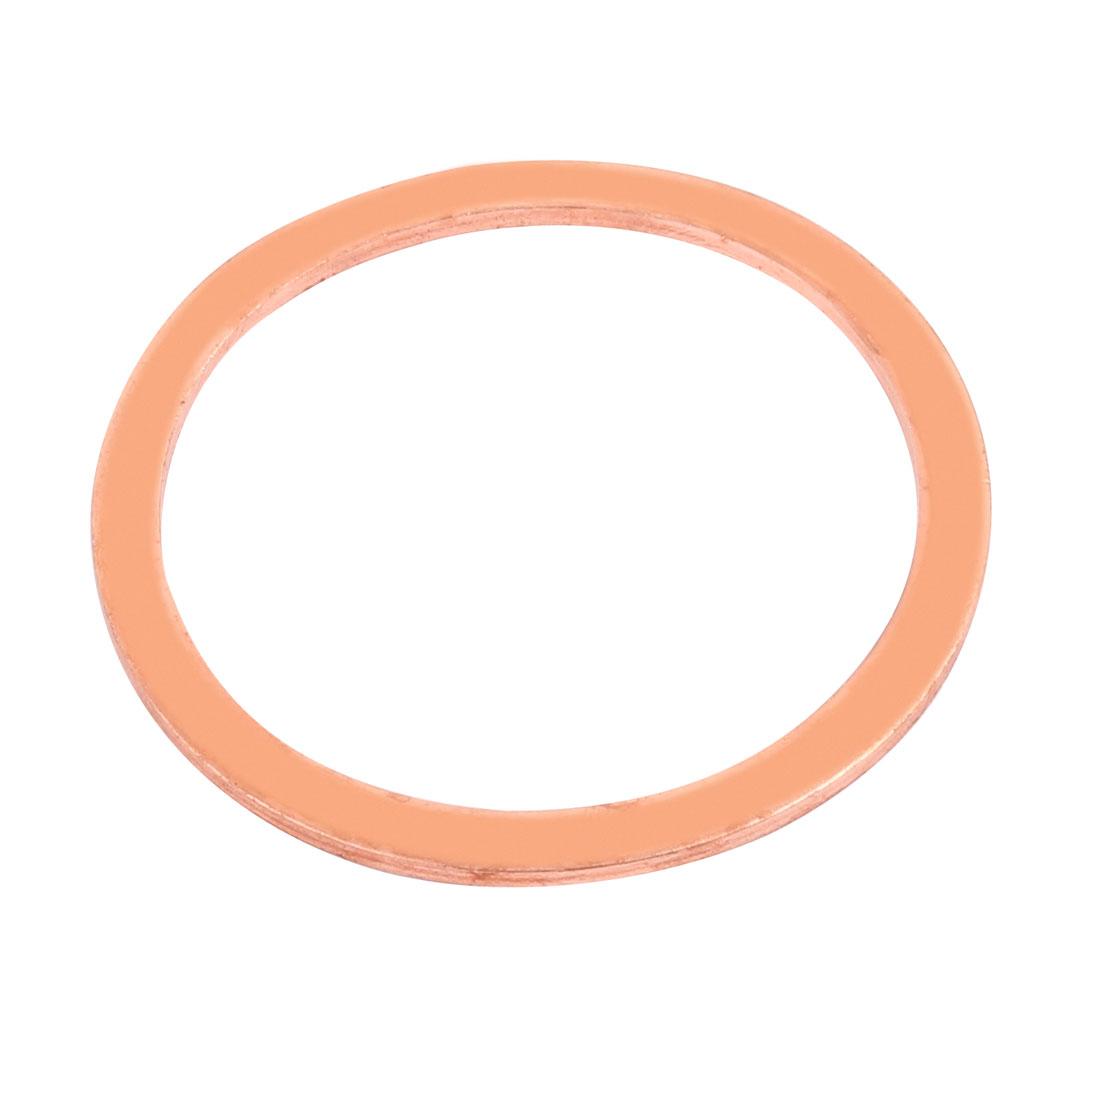 58mm x 48mm x 2mm Flat Ring Copper Crush Washer Sealing Gasket Fastener